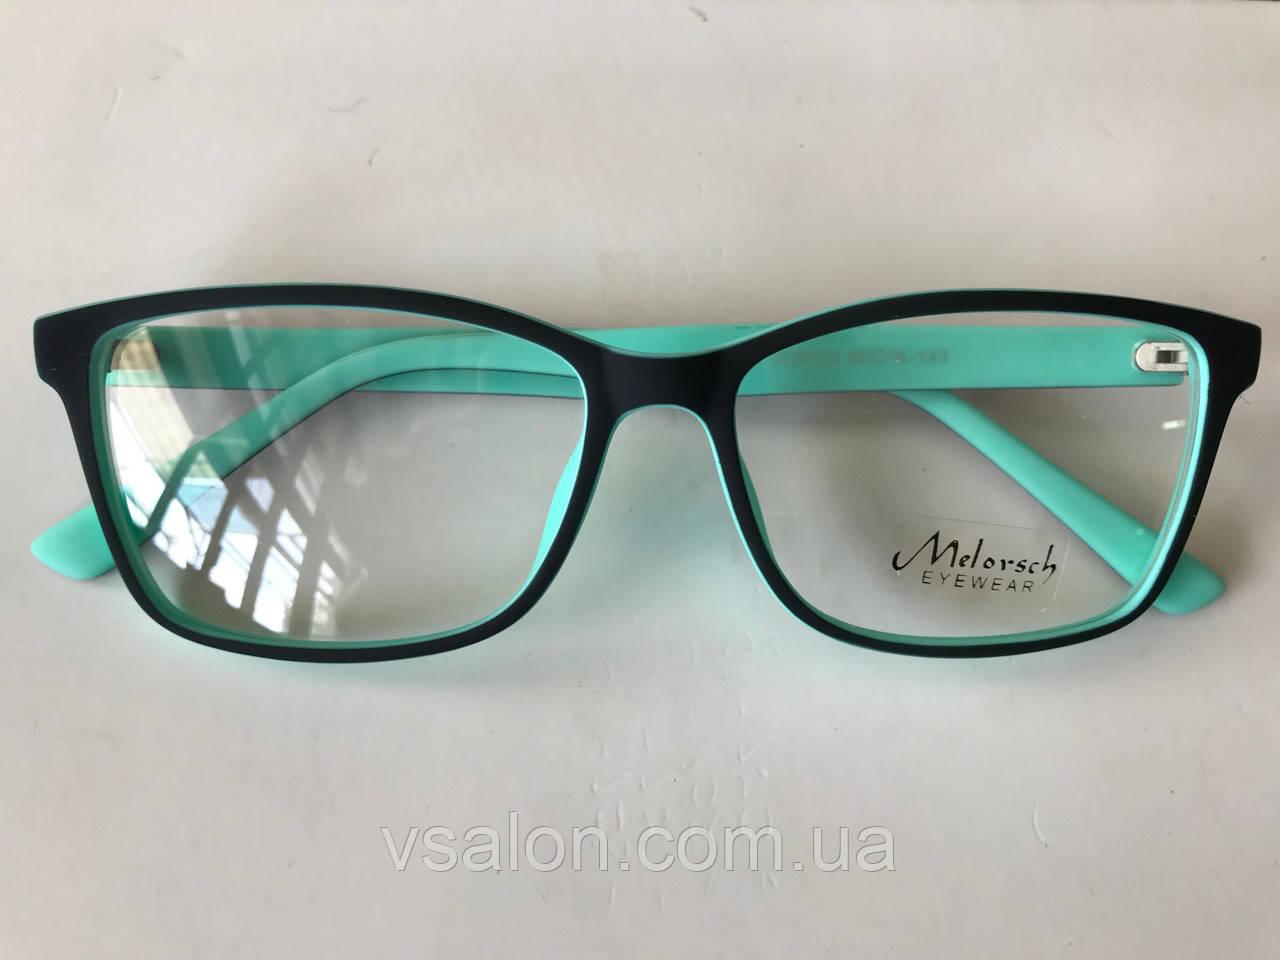 Іміджеві окуляри Melorsch 2029